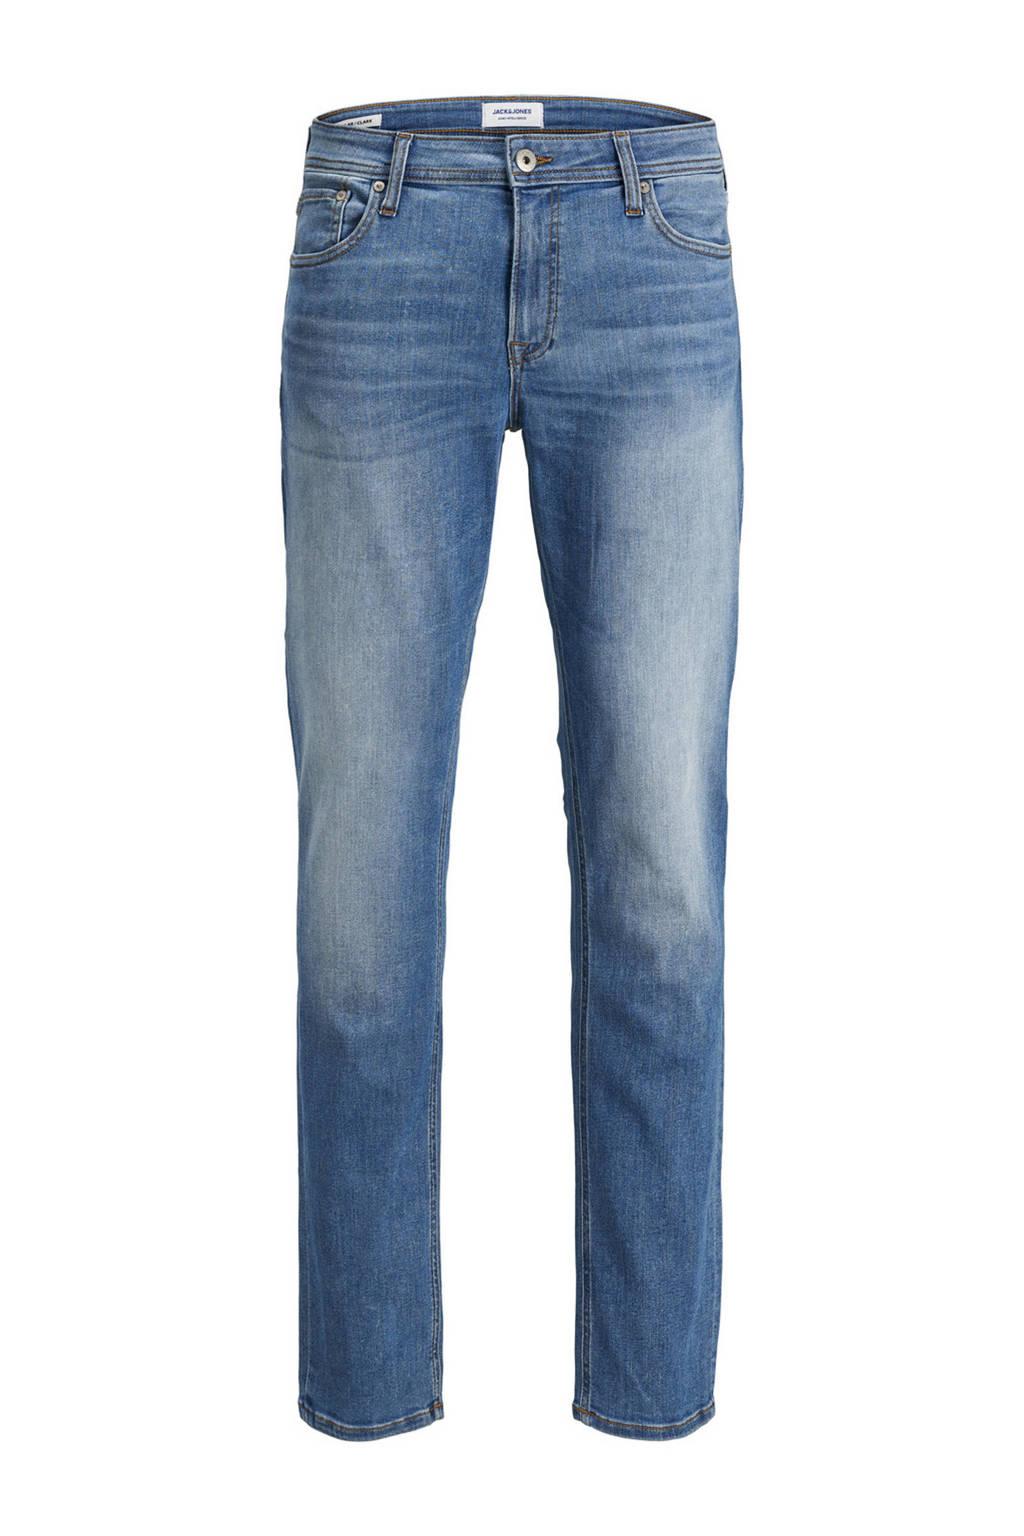 JACK & JONES JEANS INTELLIGENCE regular fit jeans Clark light denim, Light denim